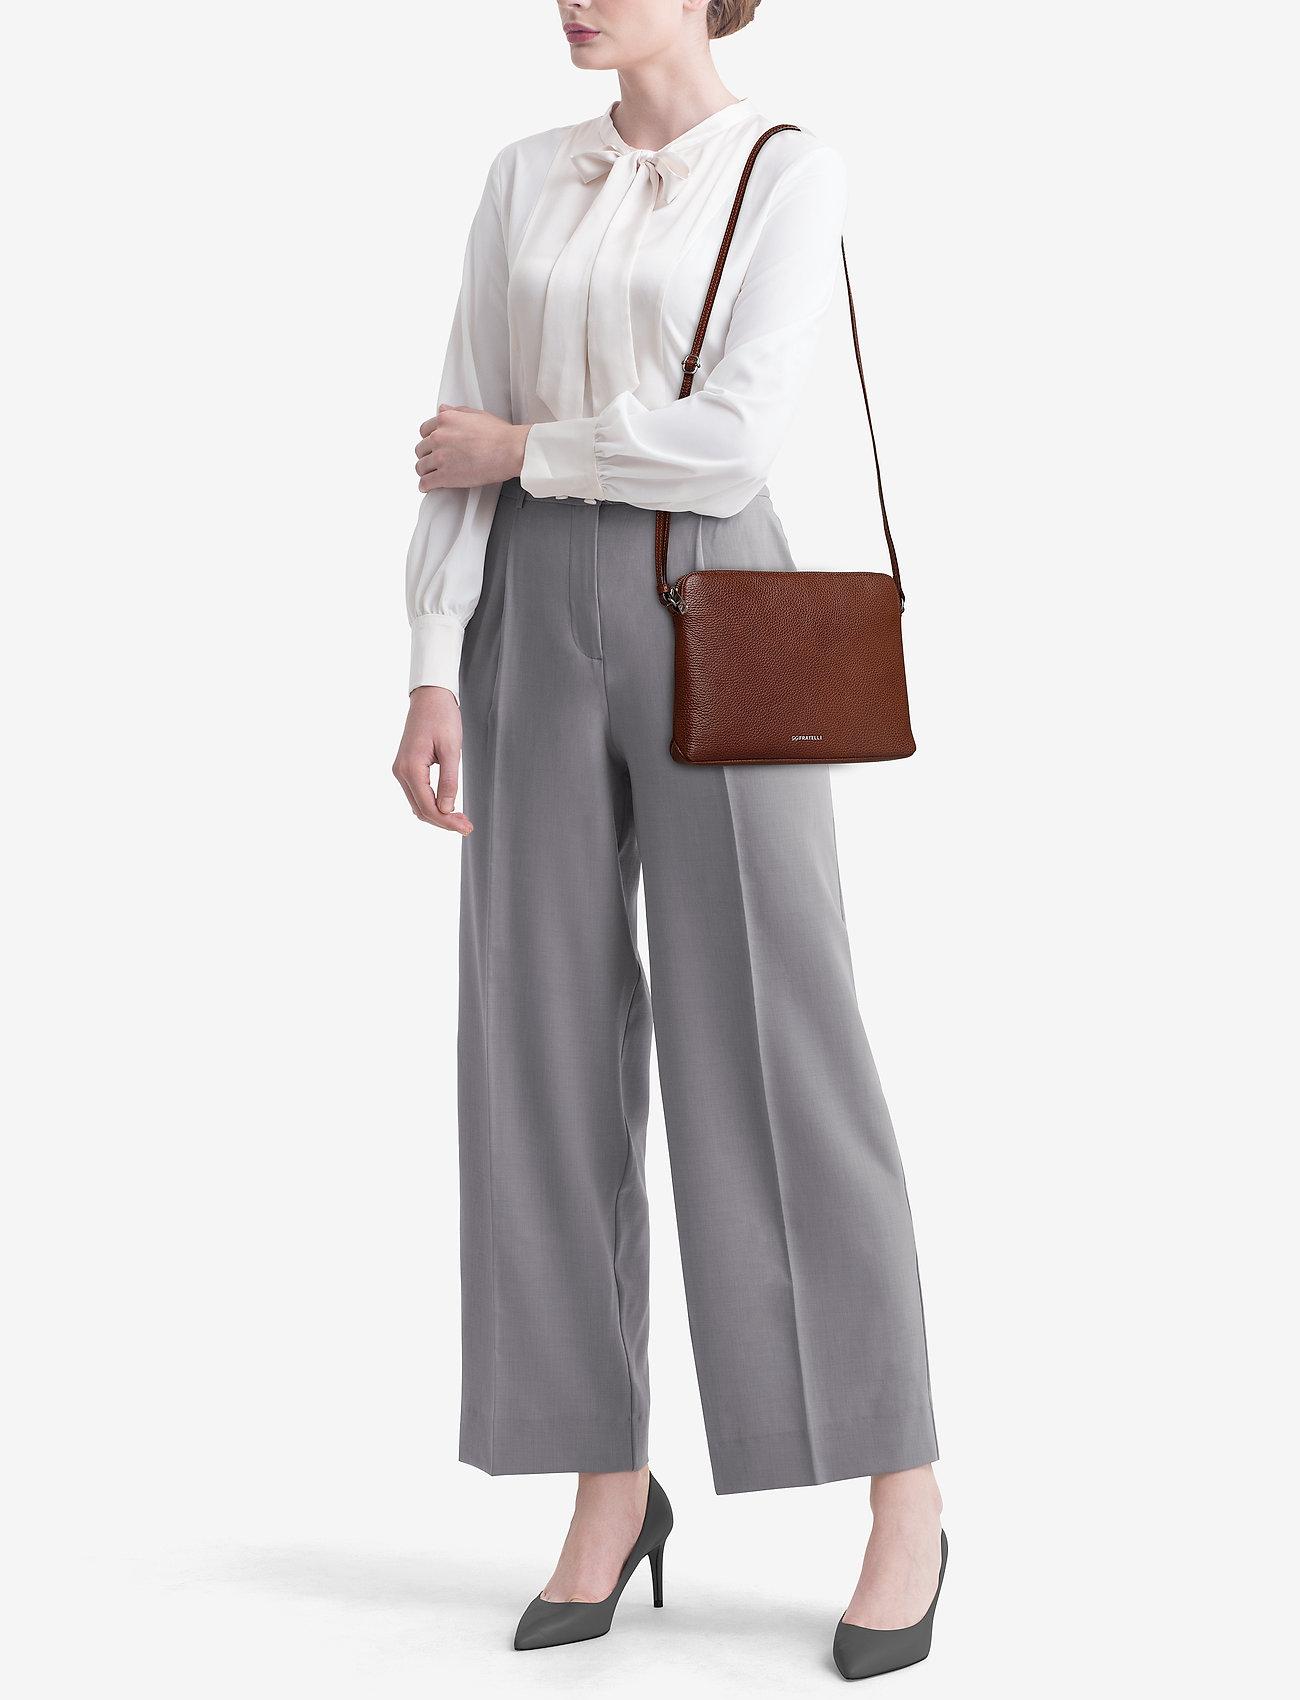 GiGi Fratelli Romance Flat bag - BRANDY